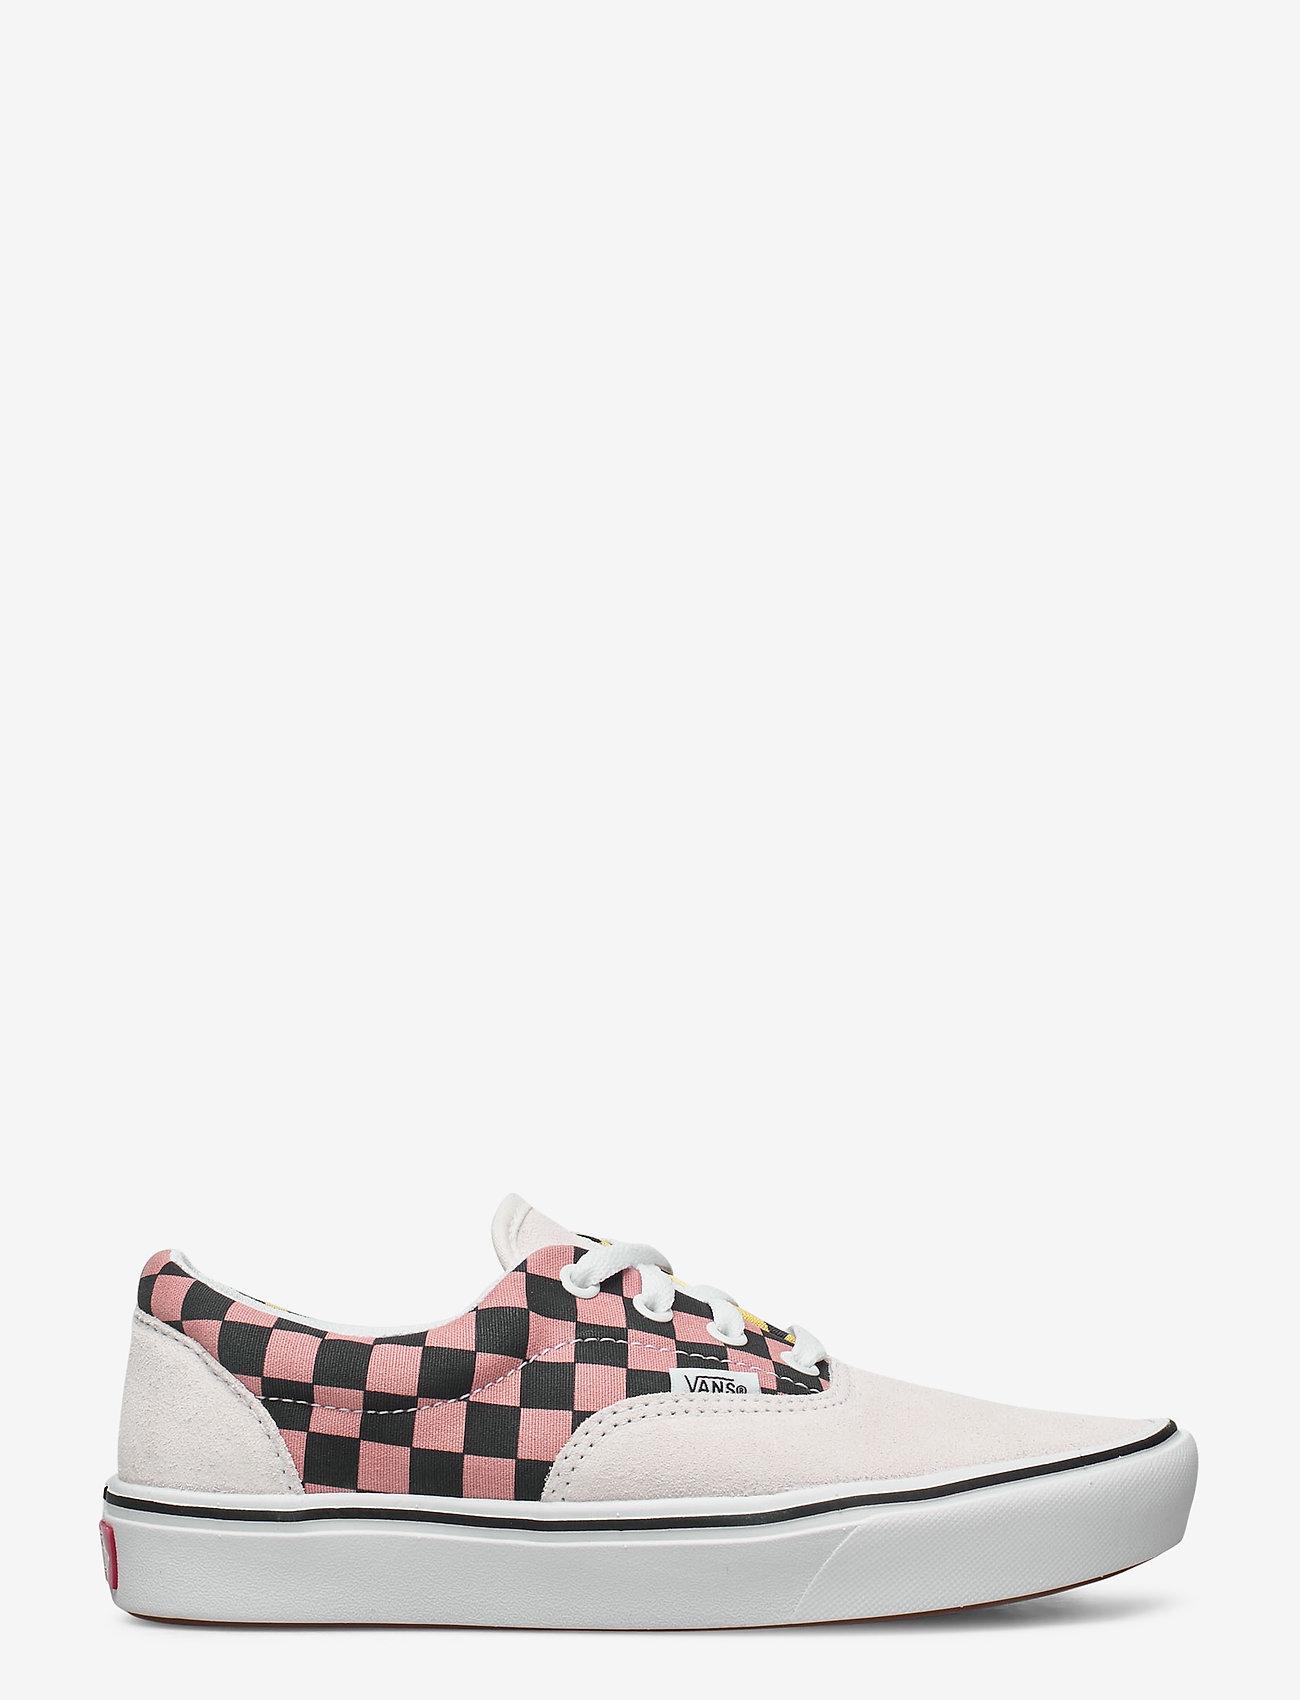 VANS - UA ComfyCush Era - lage sneakers - (mixed media) white/multi - 1